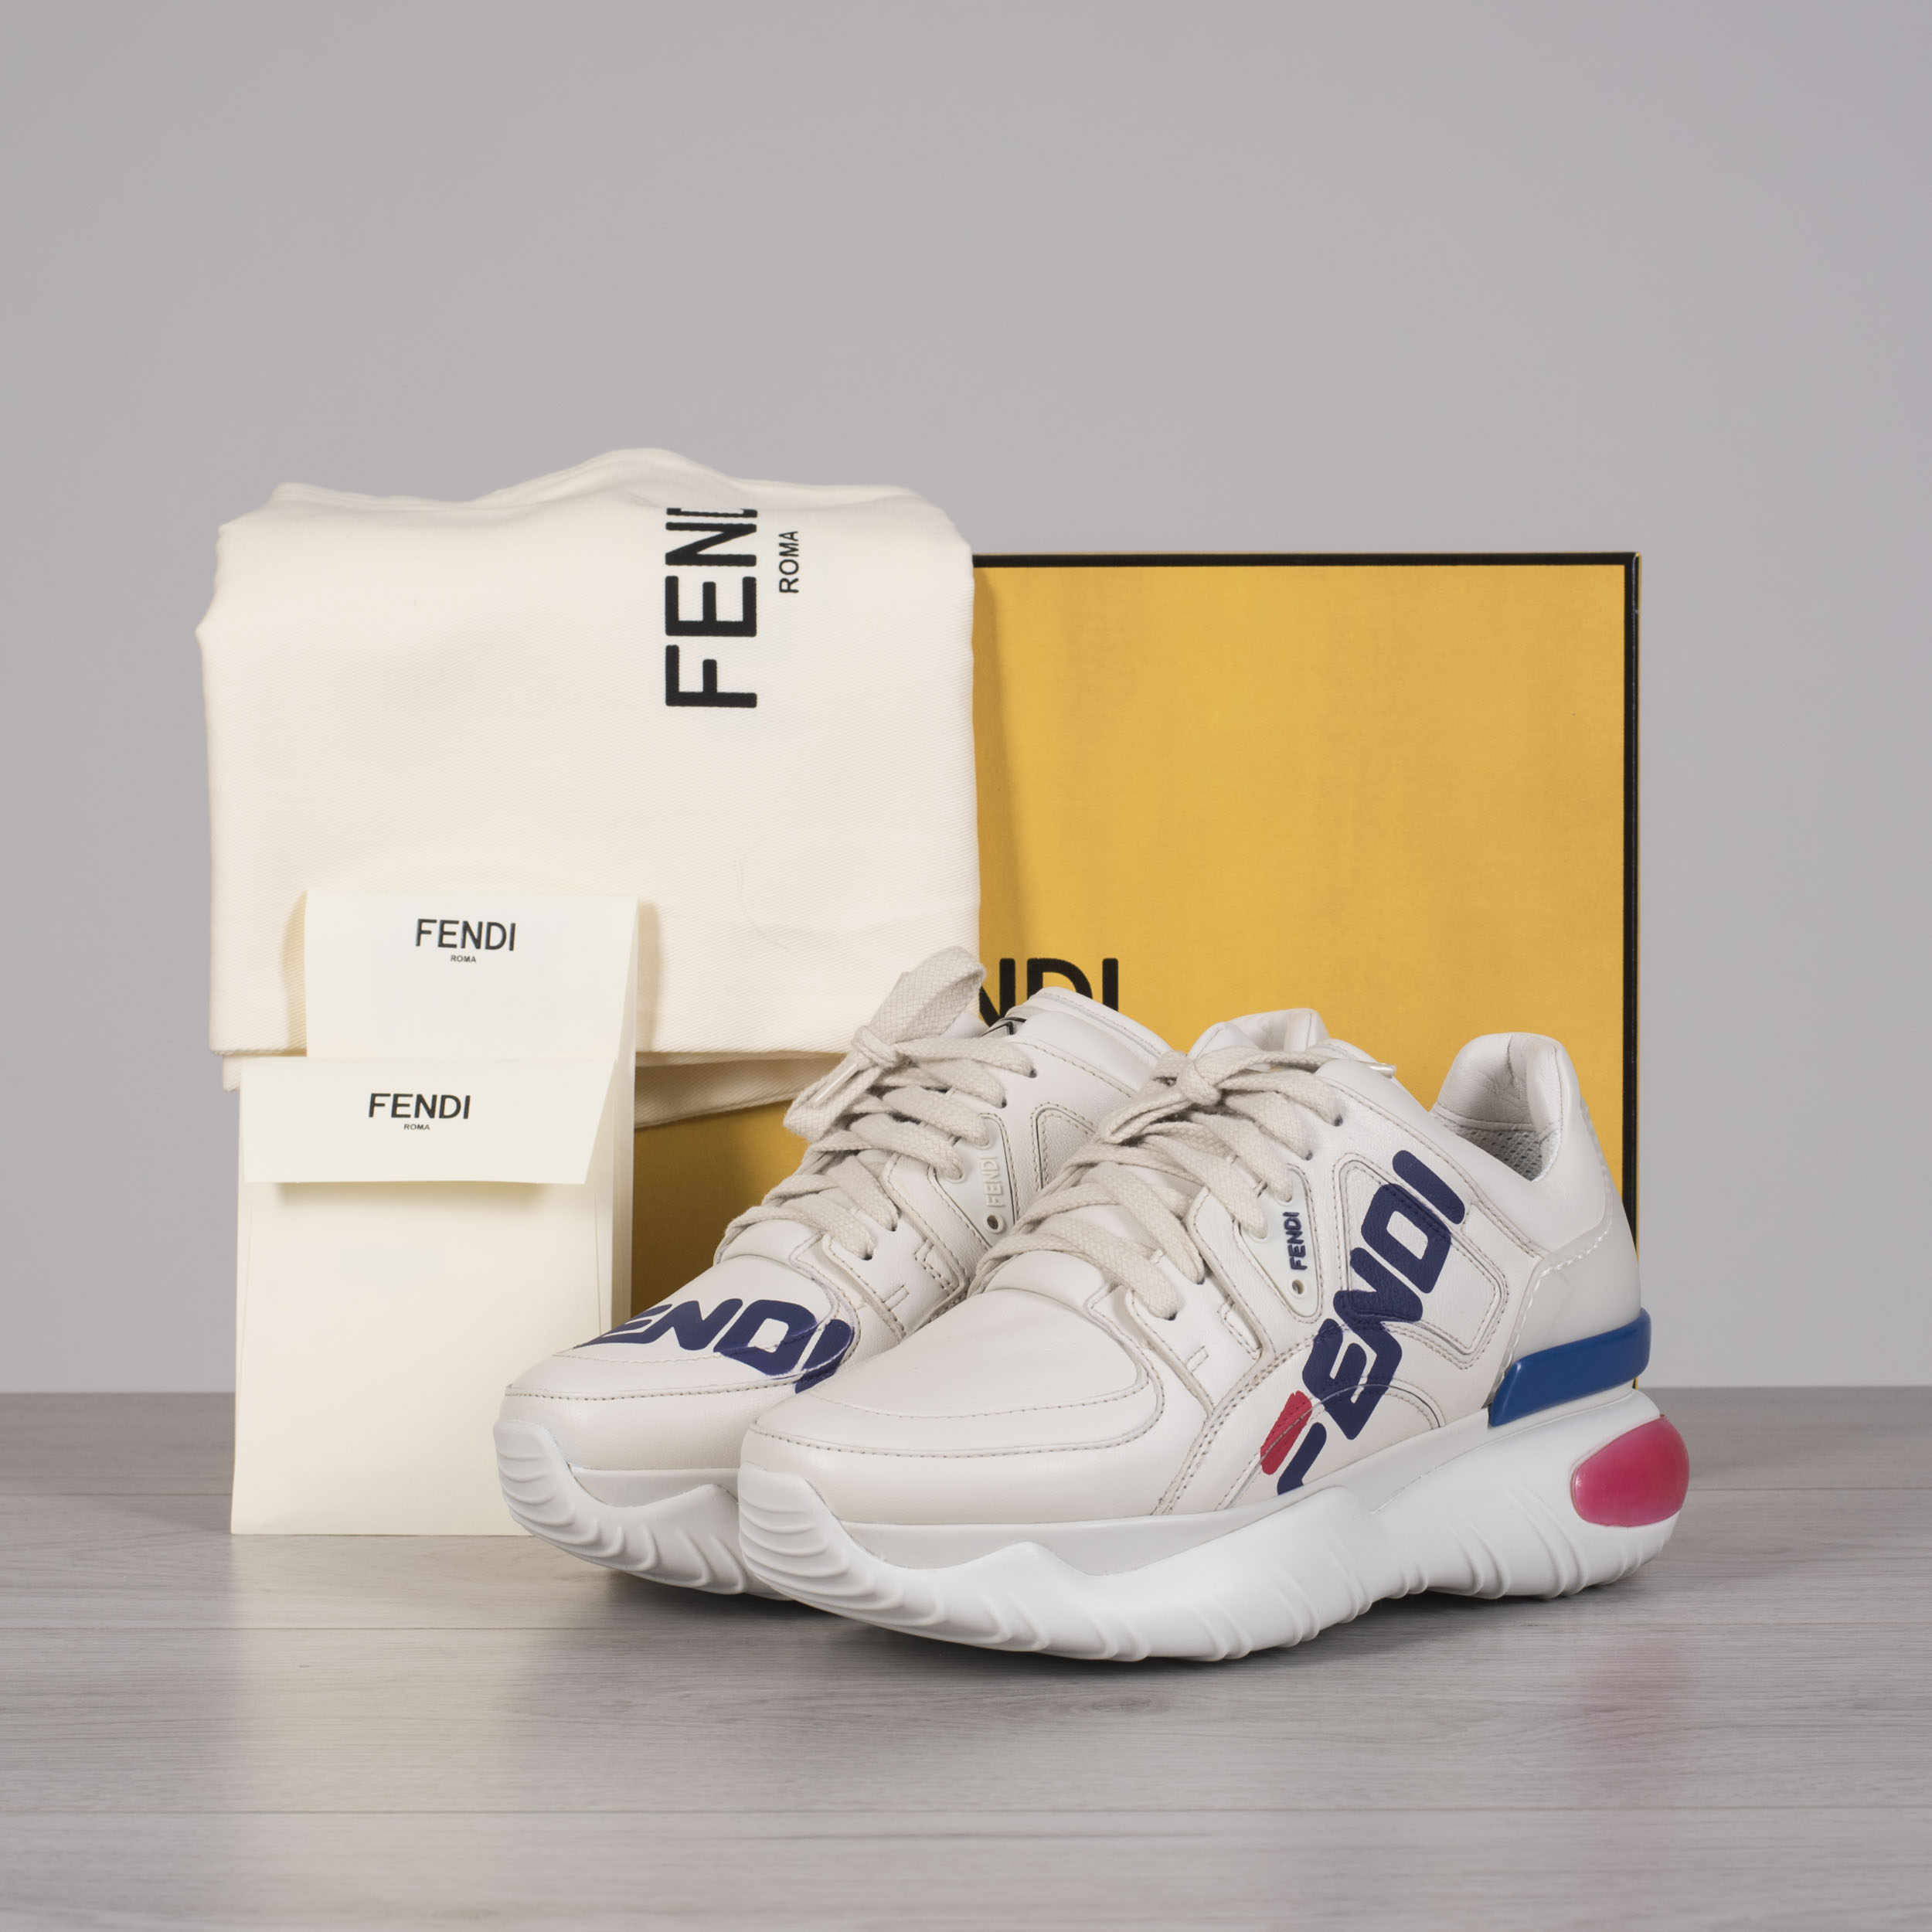 Details about FENDI x FILA 950$ Off White Leather Logo Mania Women's Sneakers